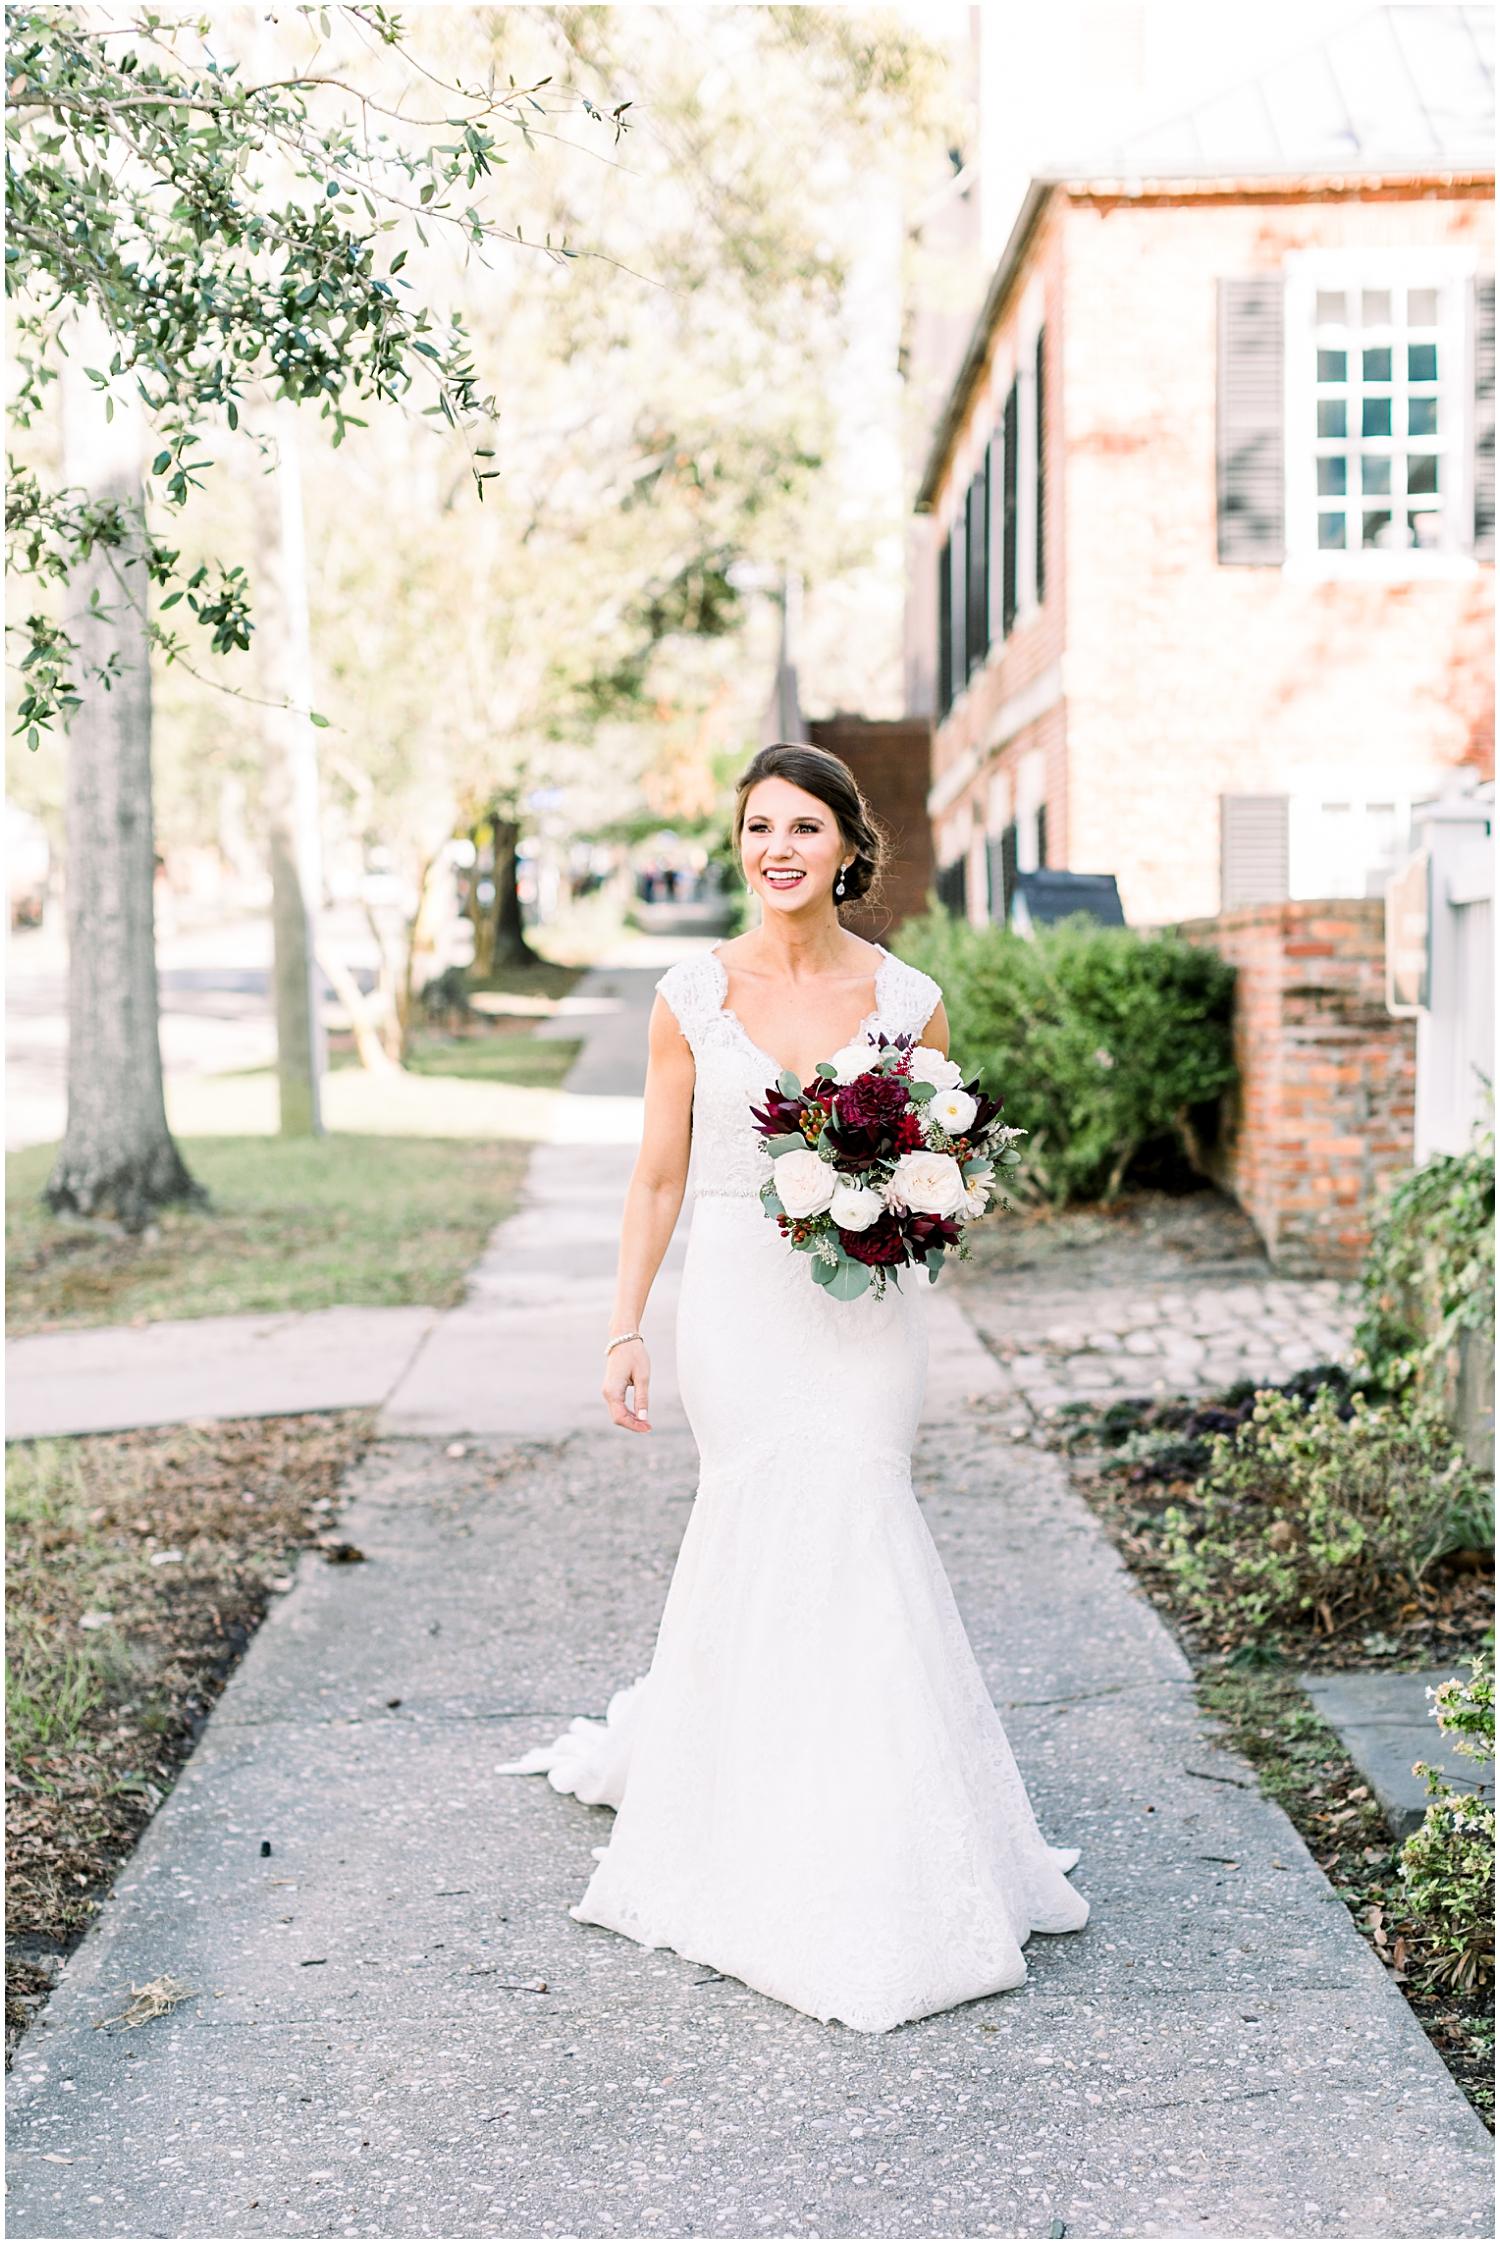 128 South Wedding venue, Downtown Wilmington NC Wedding_Erin L. Taylor Photography_0020.jpg